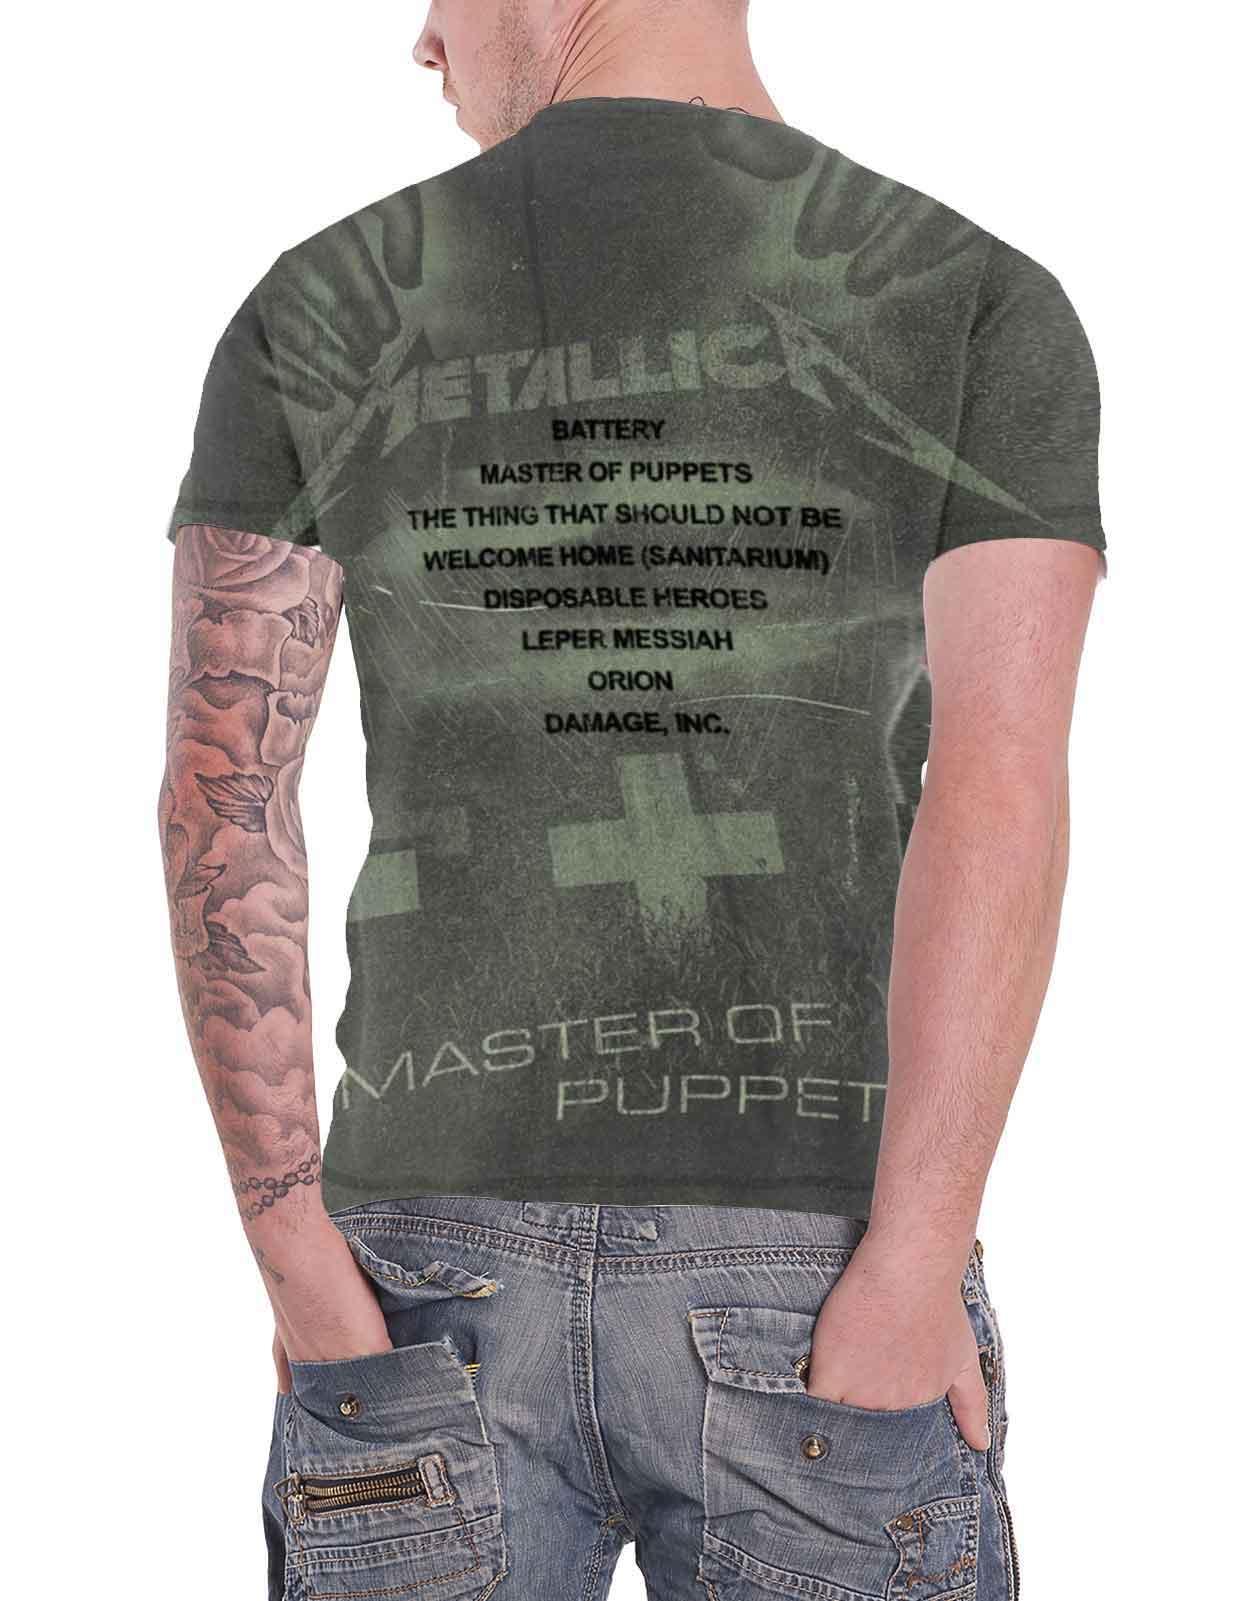 Officiel-Metallica-T-shirt-filaire-justice-for-all-RTL-Band-Logo-Homme-Nouveau miniature 35